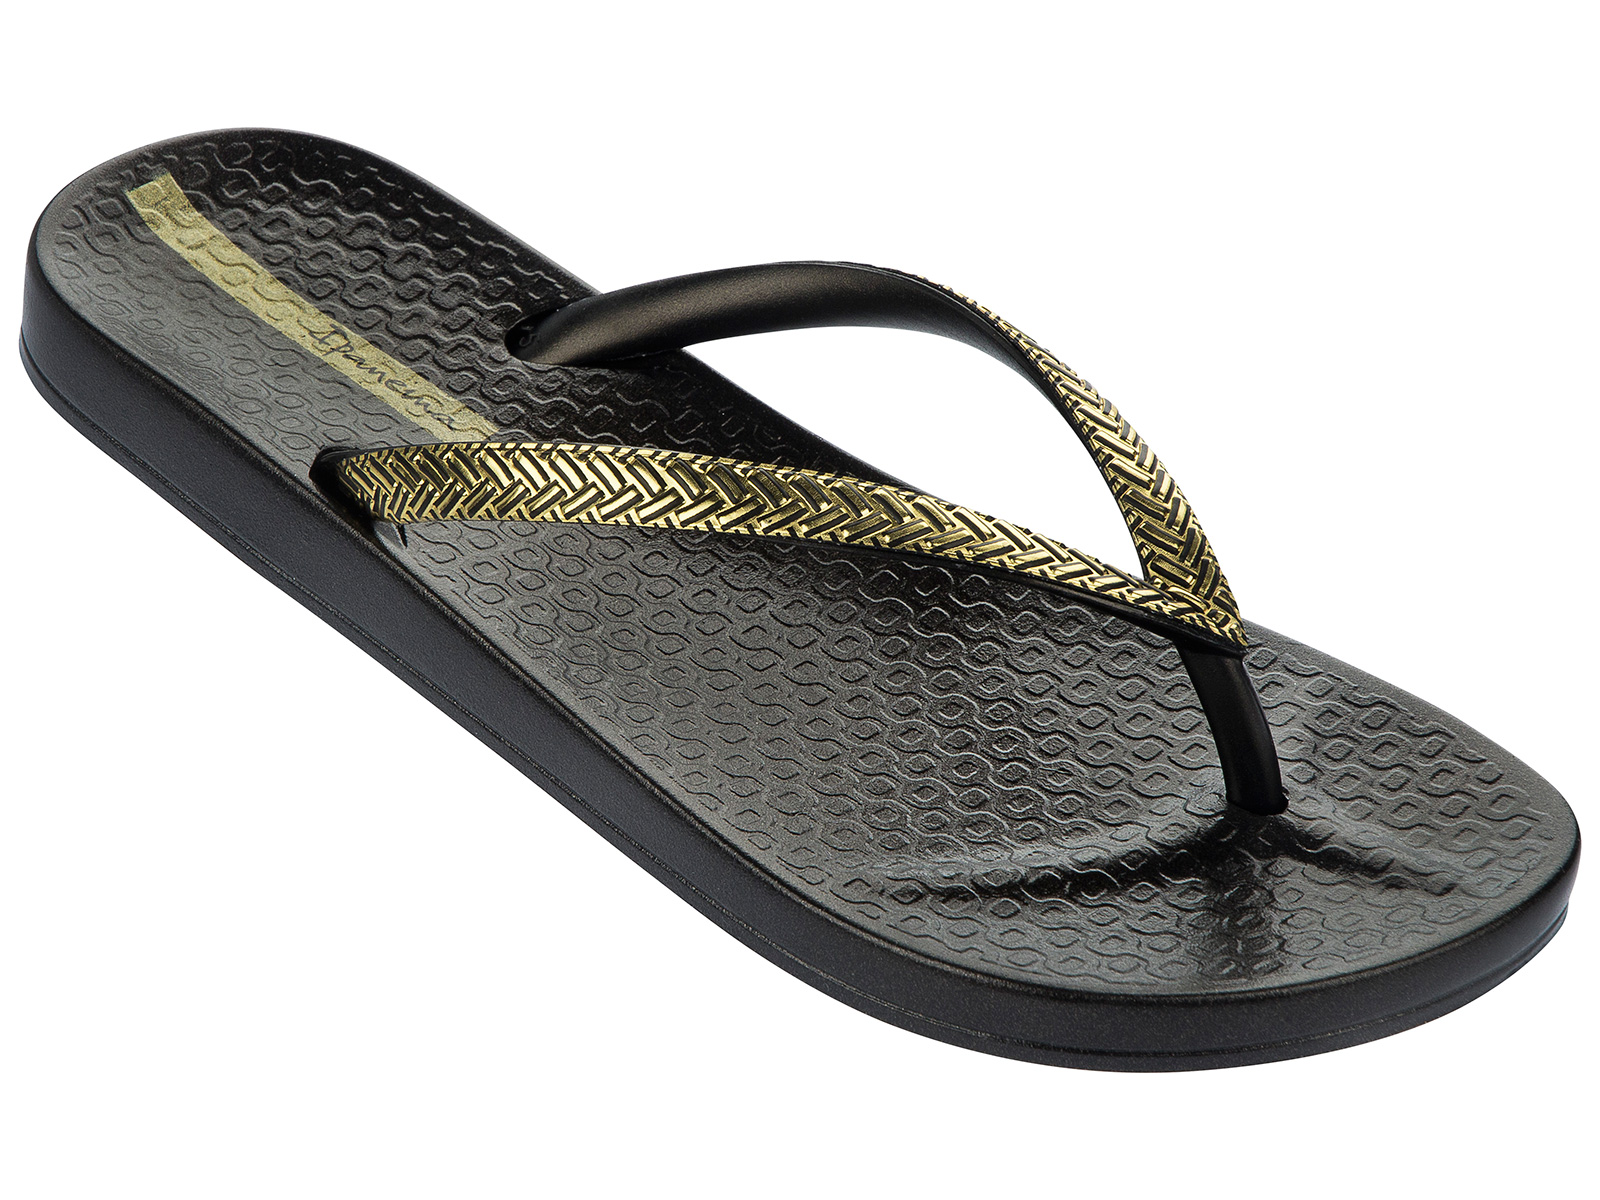 Flip-Flops Flip-Flops - Ipanema Mesh Fem Blackgold - Brand Ipanema-6277